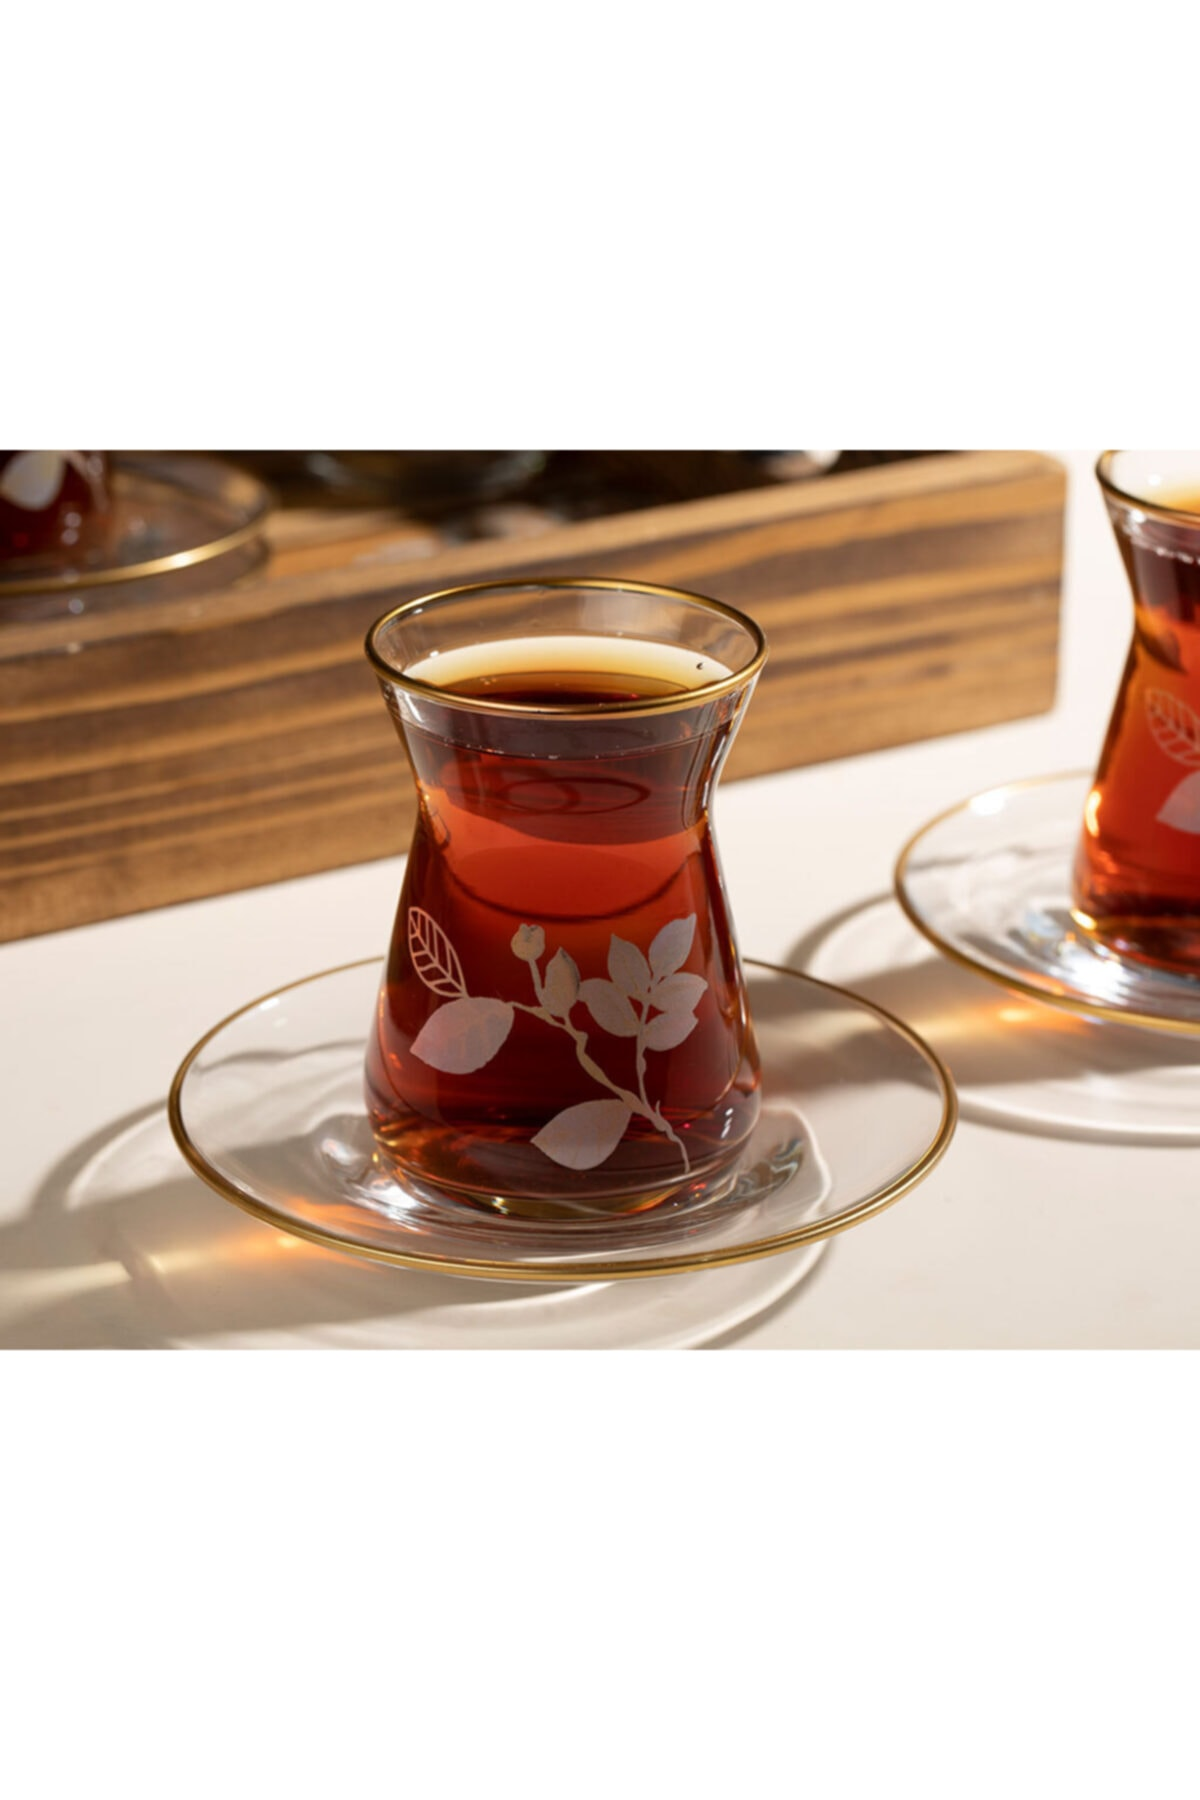 English Home Şeffaf Bahar Dalı Cam 12 Parça Çay Seti 130 ml 2